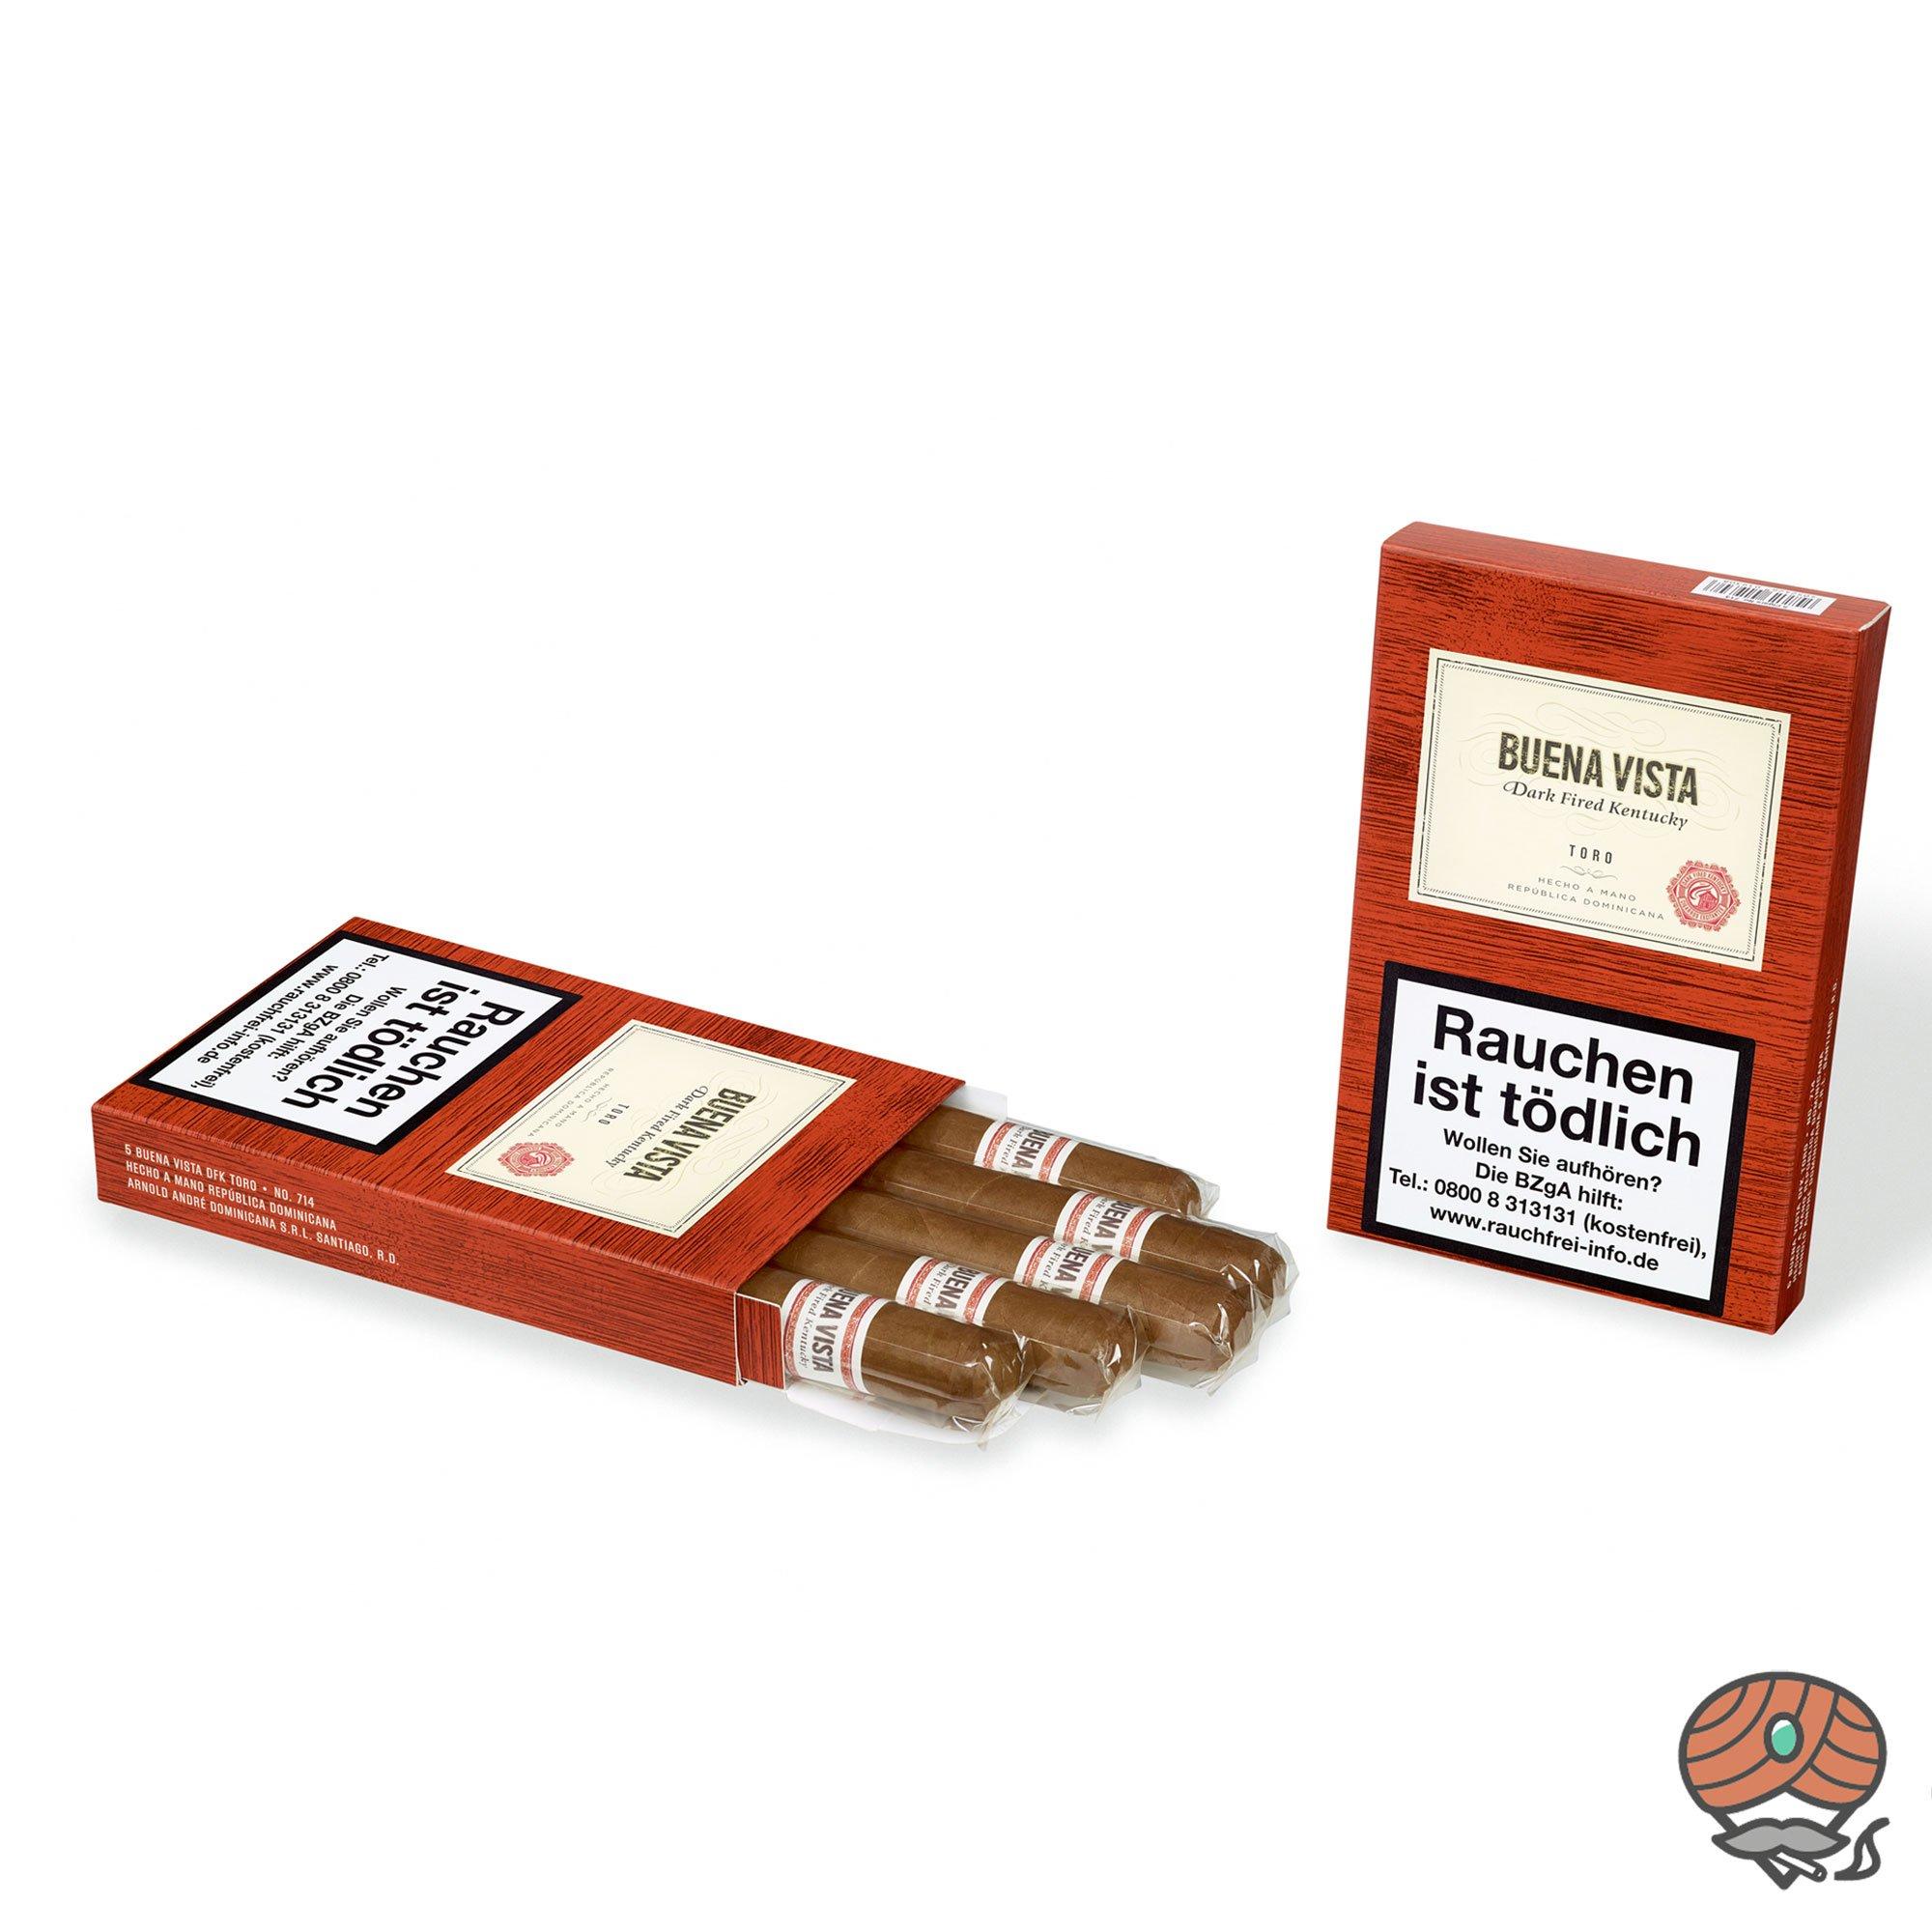 Buena Vista Dark Fired Kentucky Toro Zigarre Dominikanische Republik 5er Pack